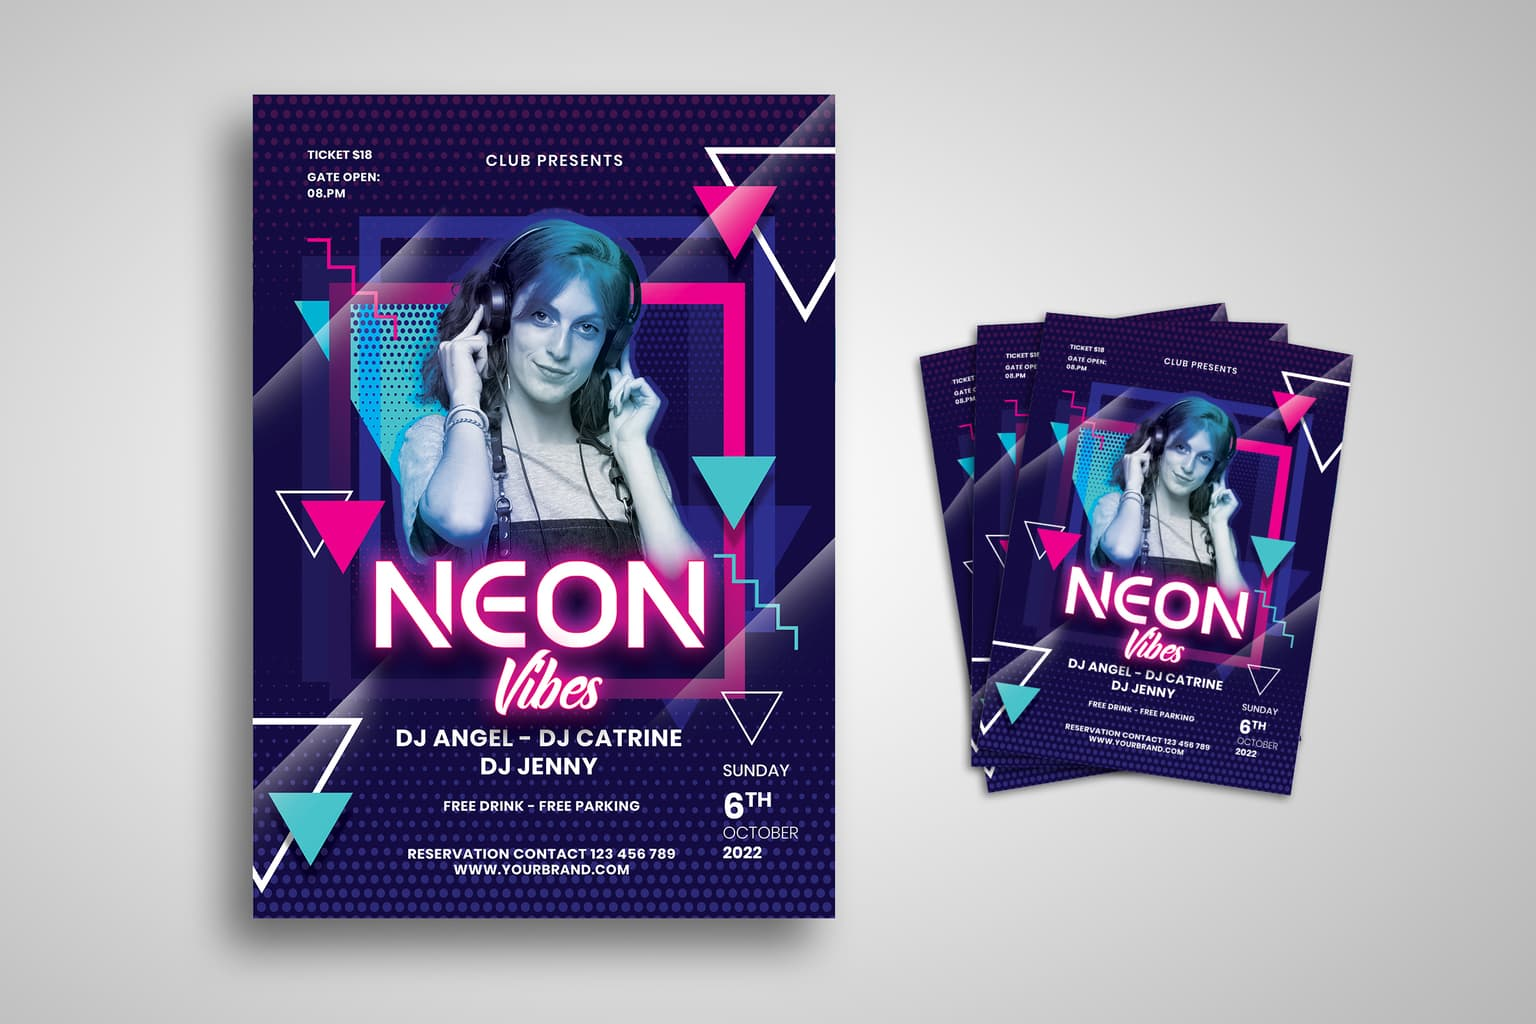 flyer neon vibe presents 9